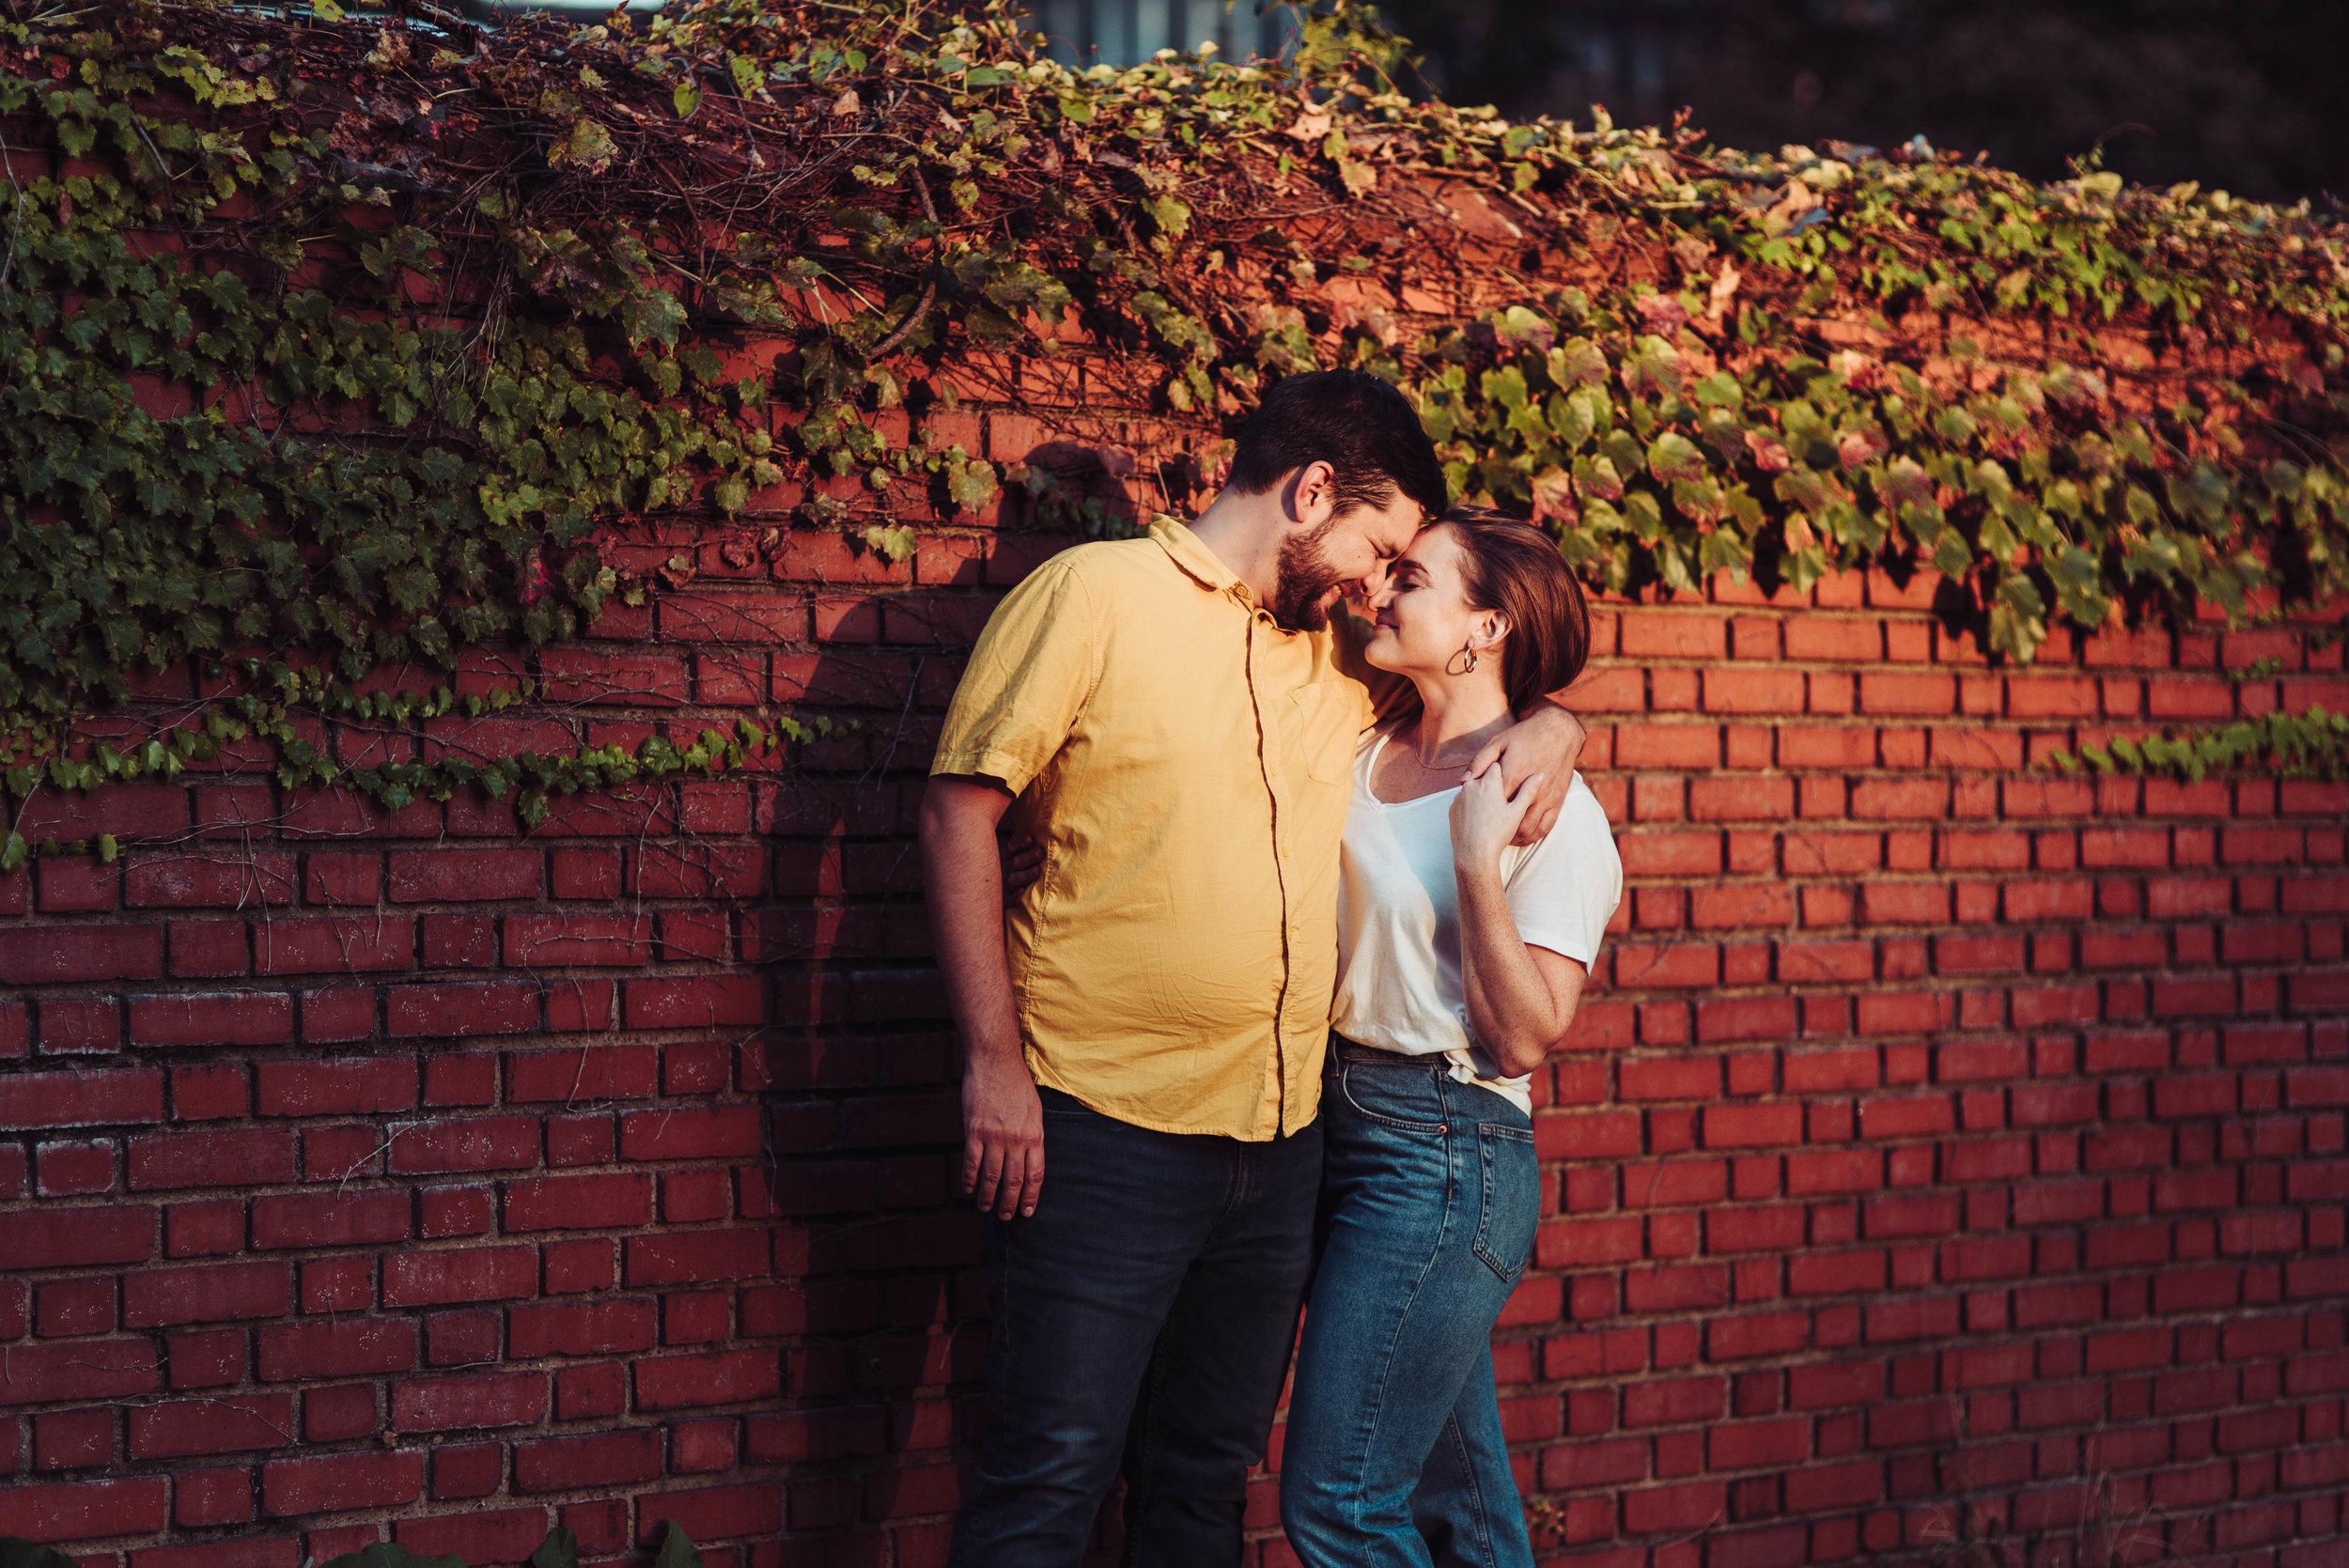 pittsburgh engagement photos-39.jpg